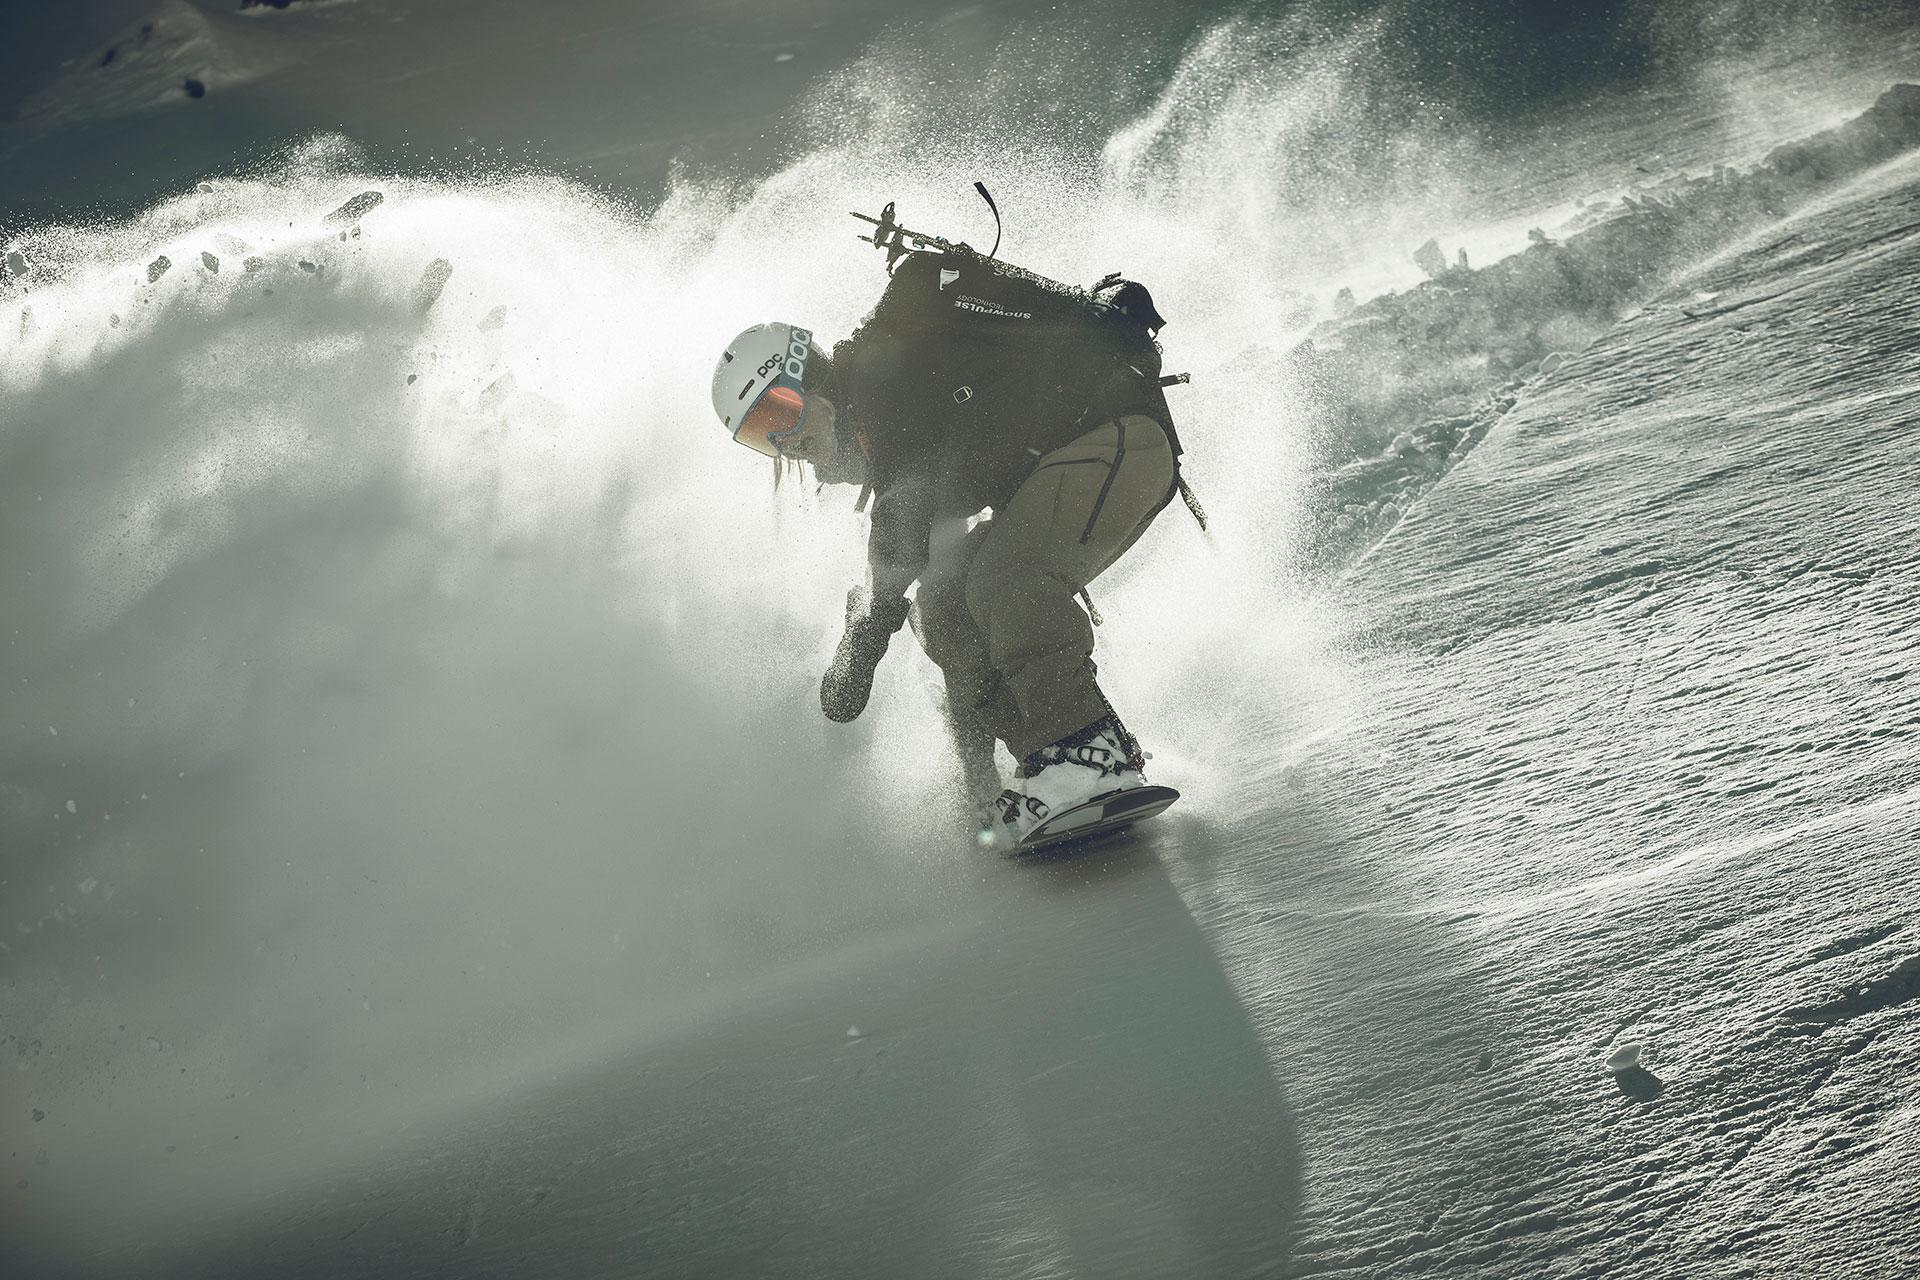 Snowboard Aktion Sport Fotograf winter Splitboard Produktion Tiefschnee